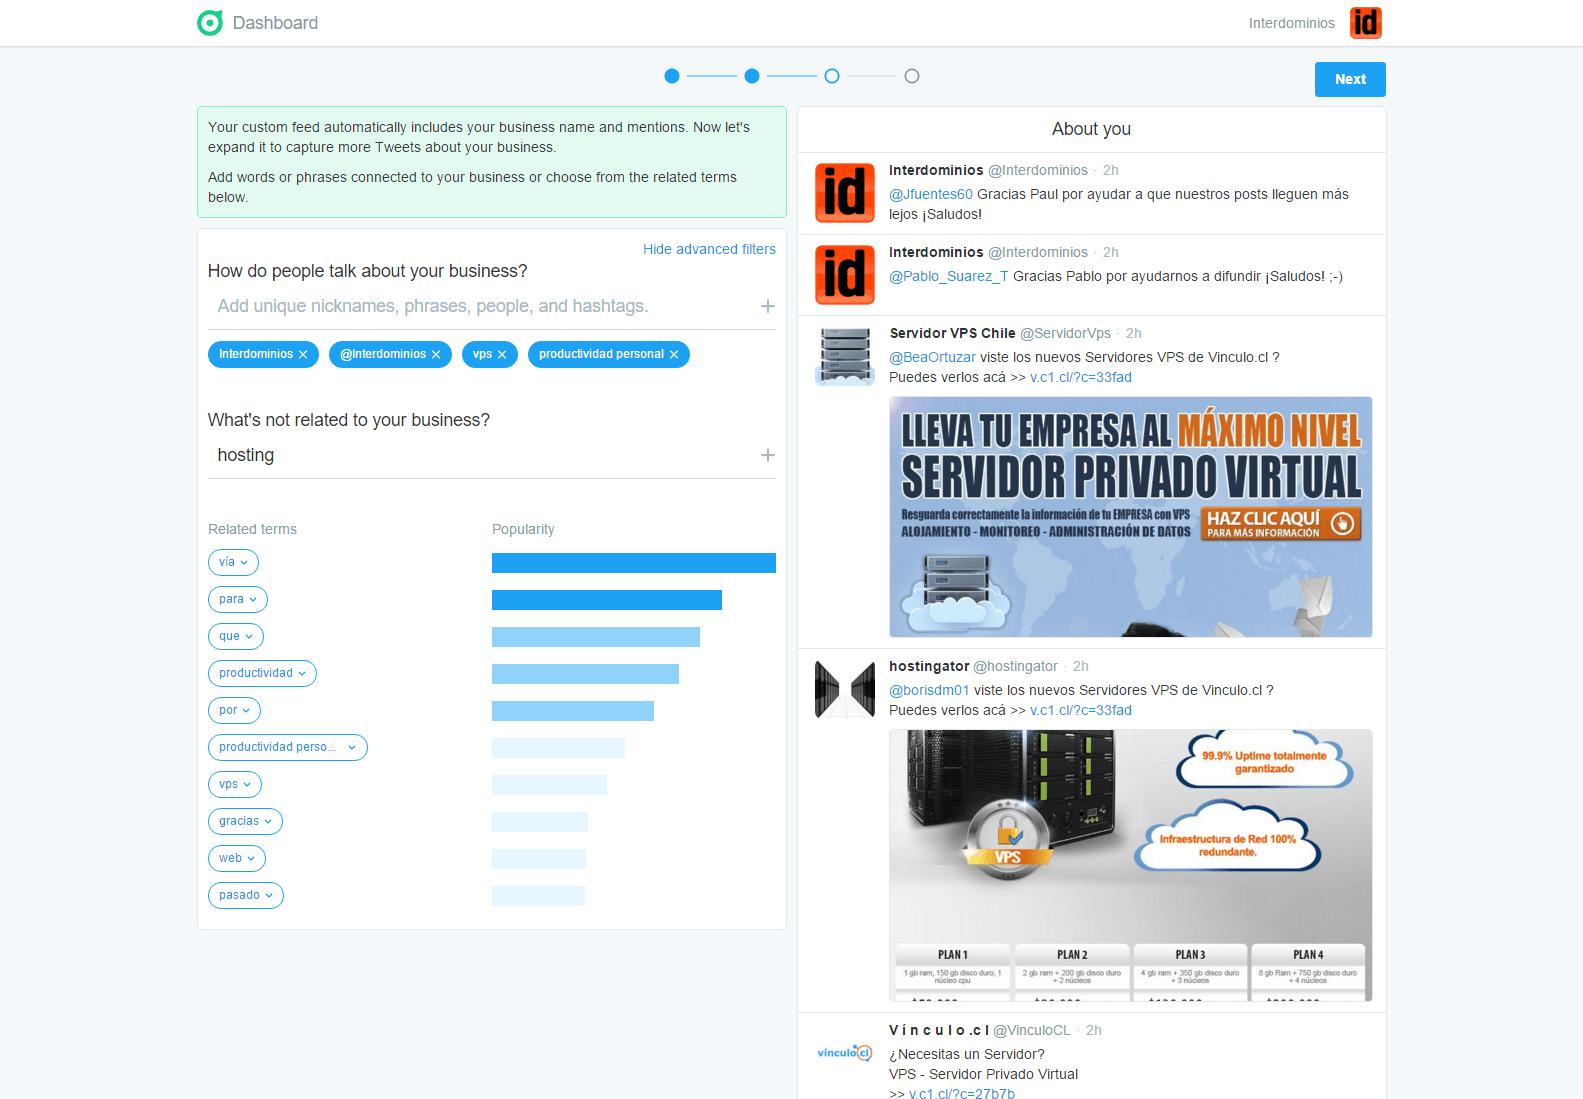 FireShot Capture 5 - Twitter Dashboard - https___dashboard.twitter.com_i_onboard#1